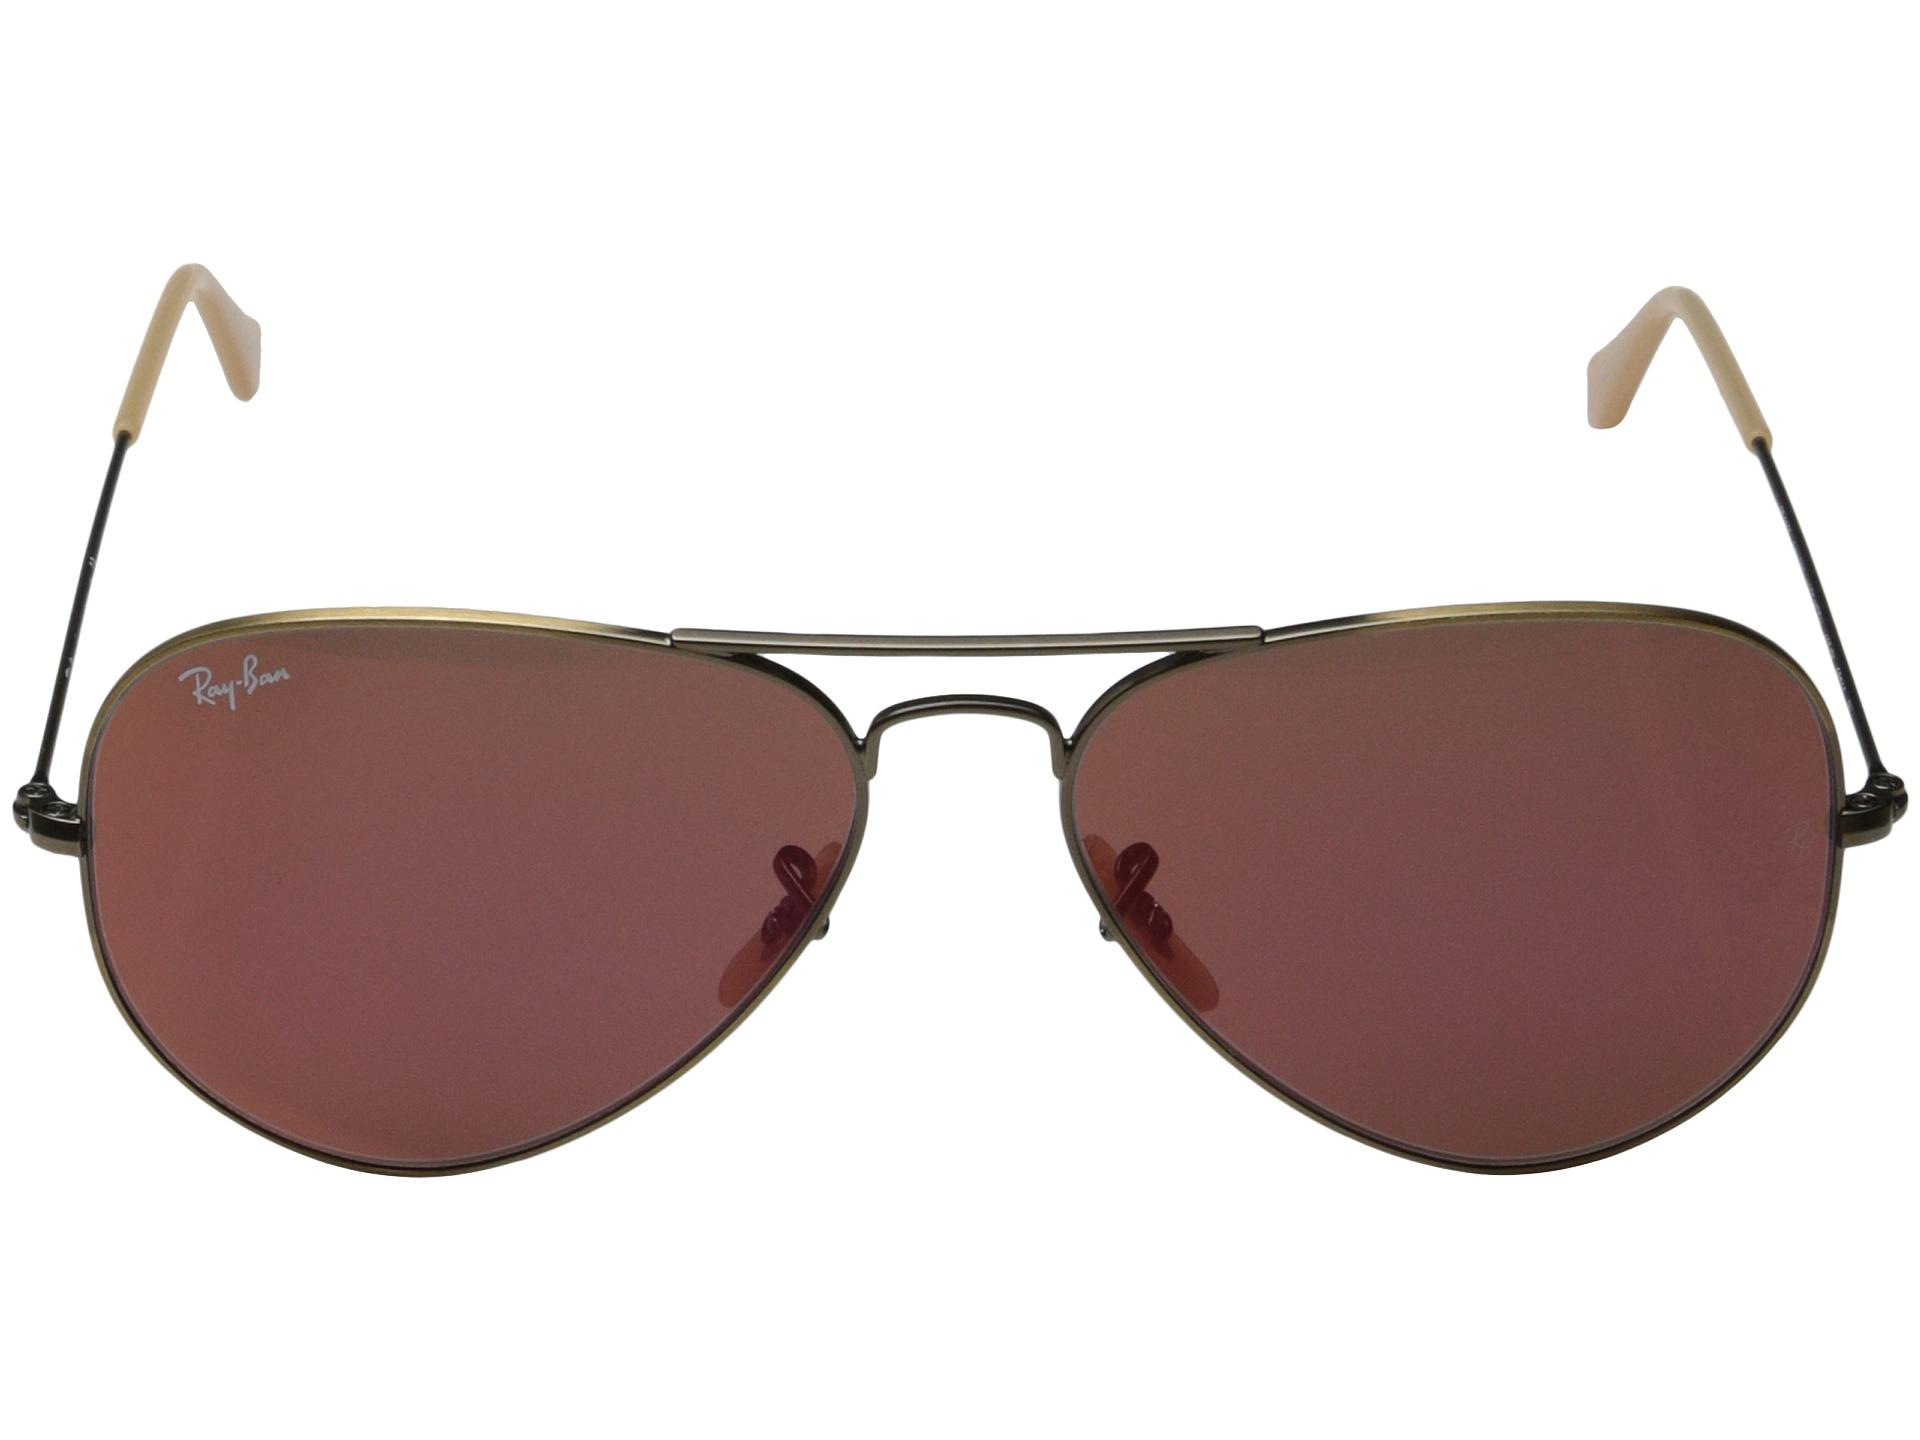 564a7f169f3 Ray Ban Rb 3025 58 Original Aviator Sunglasses 58mm Uv « Heritage Malta